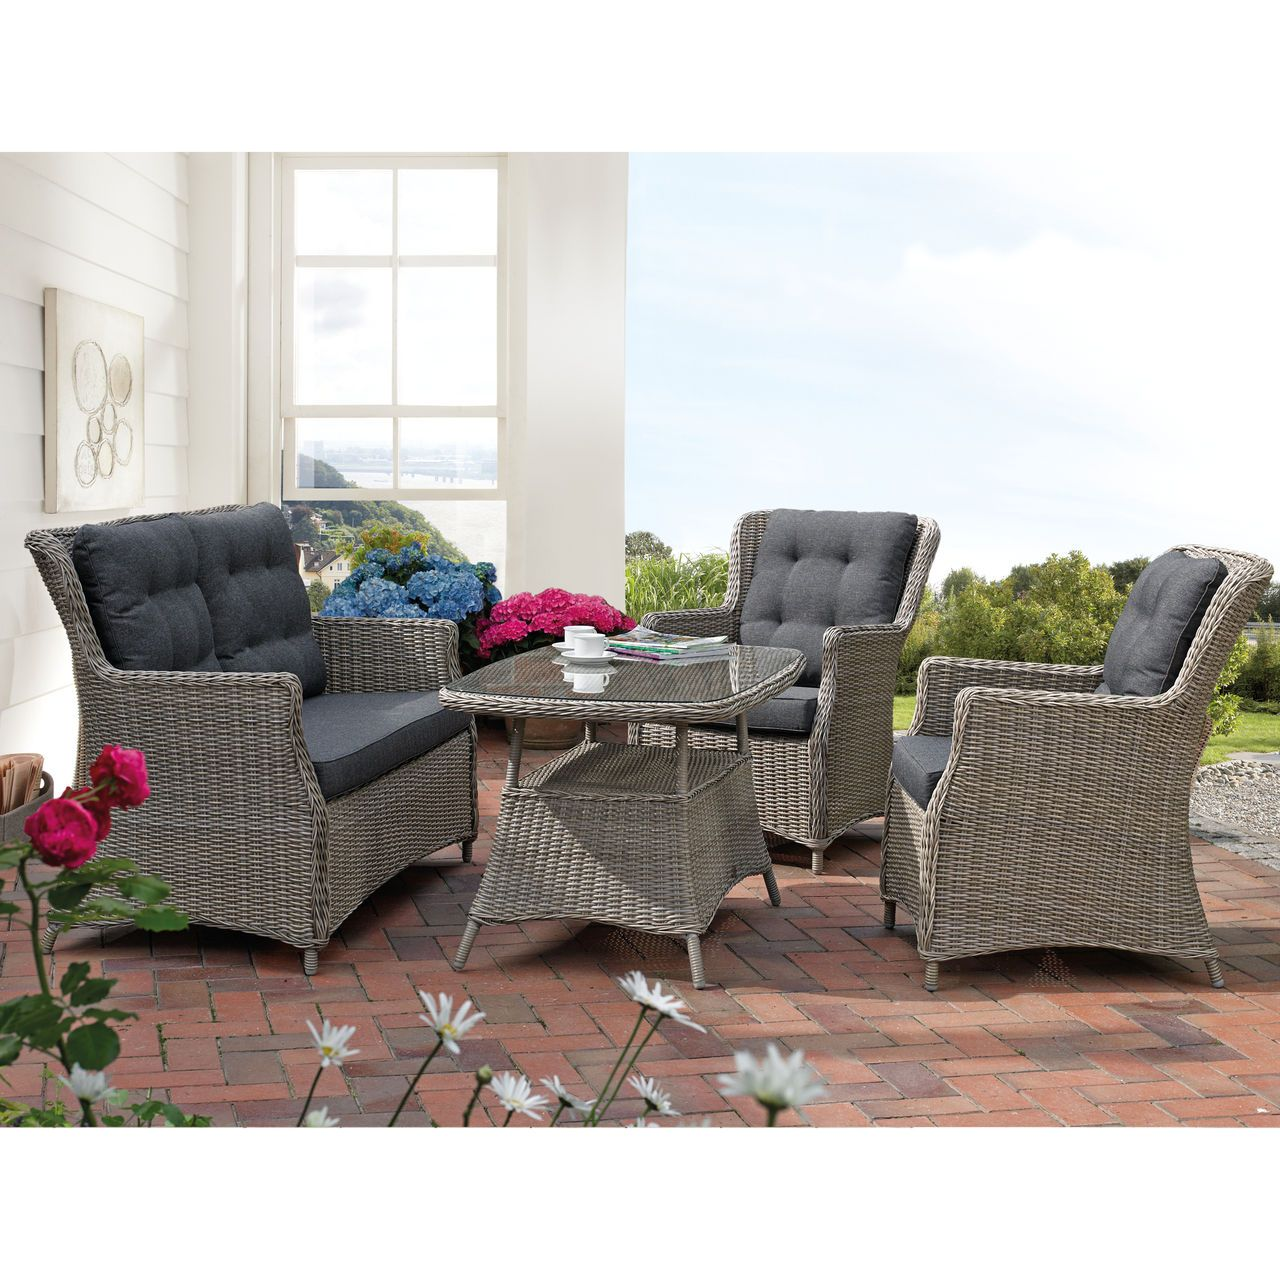 Perfect Lounge M bel f r den Garten